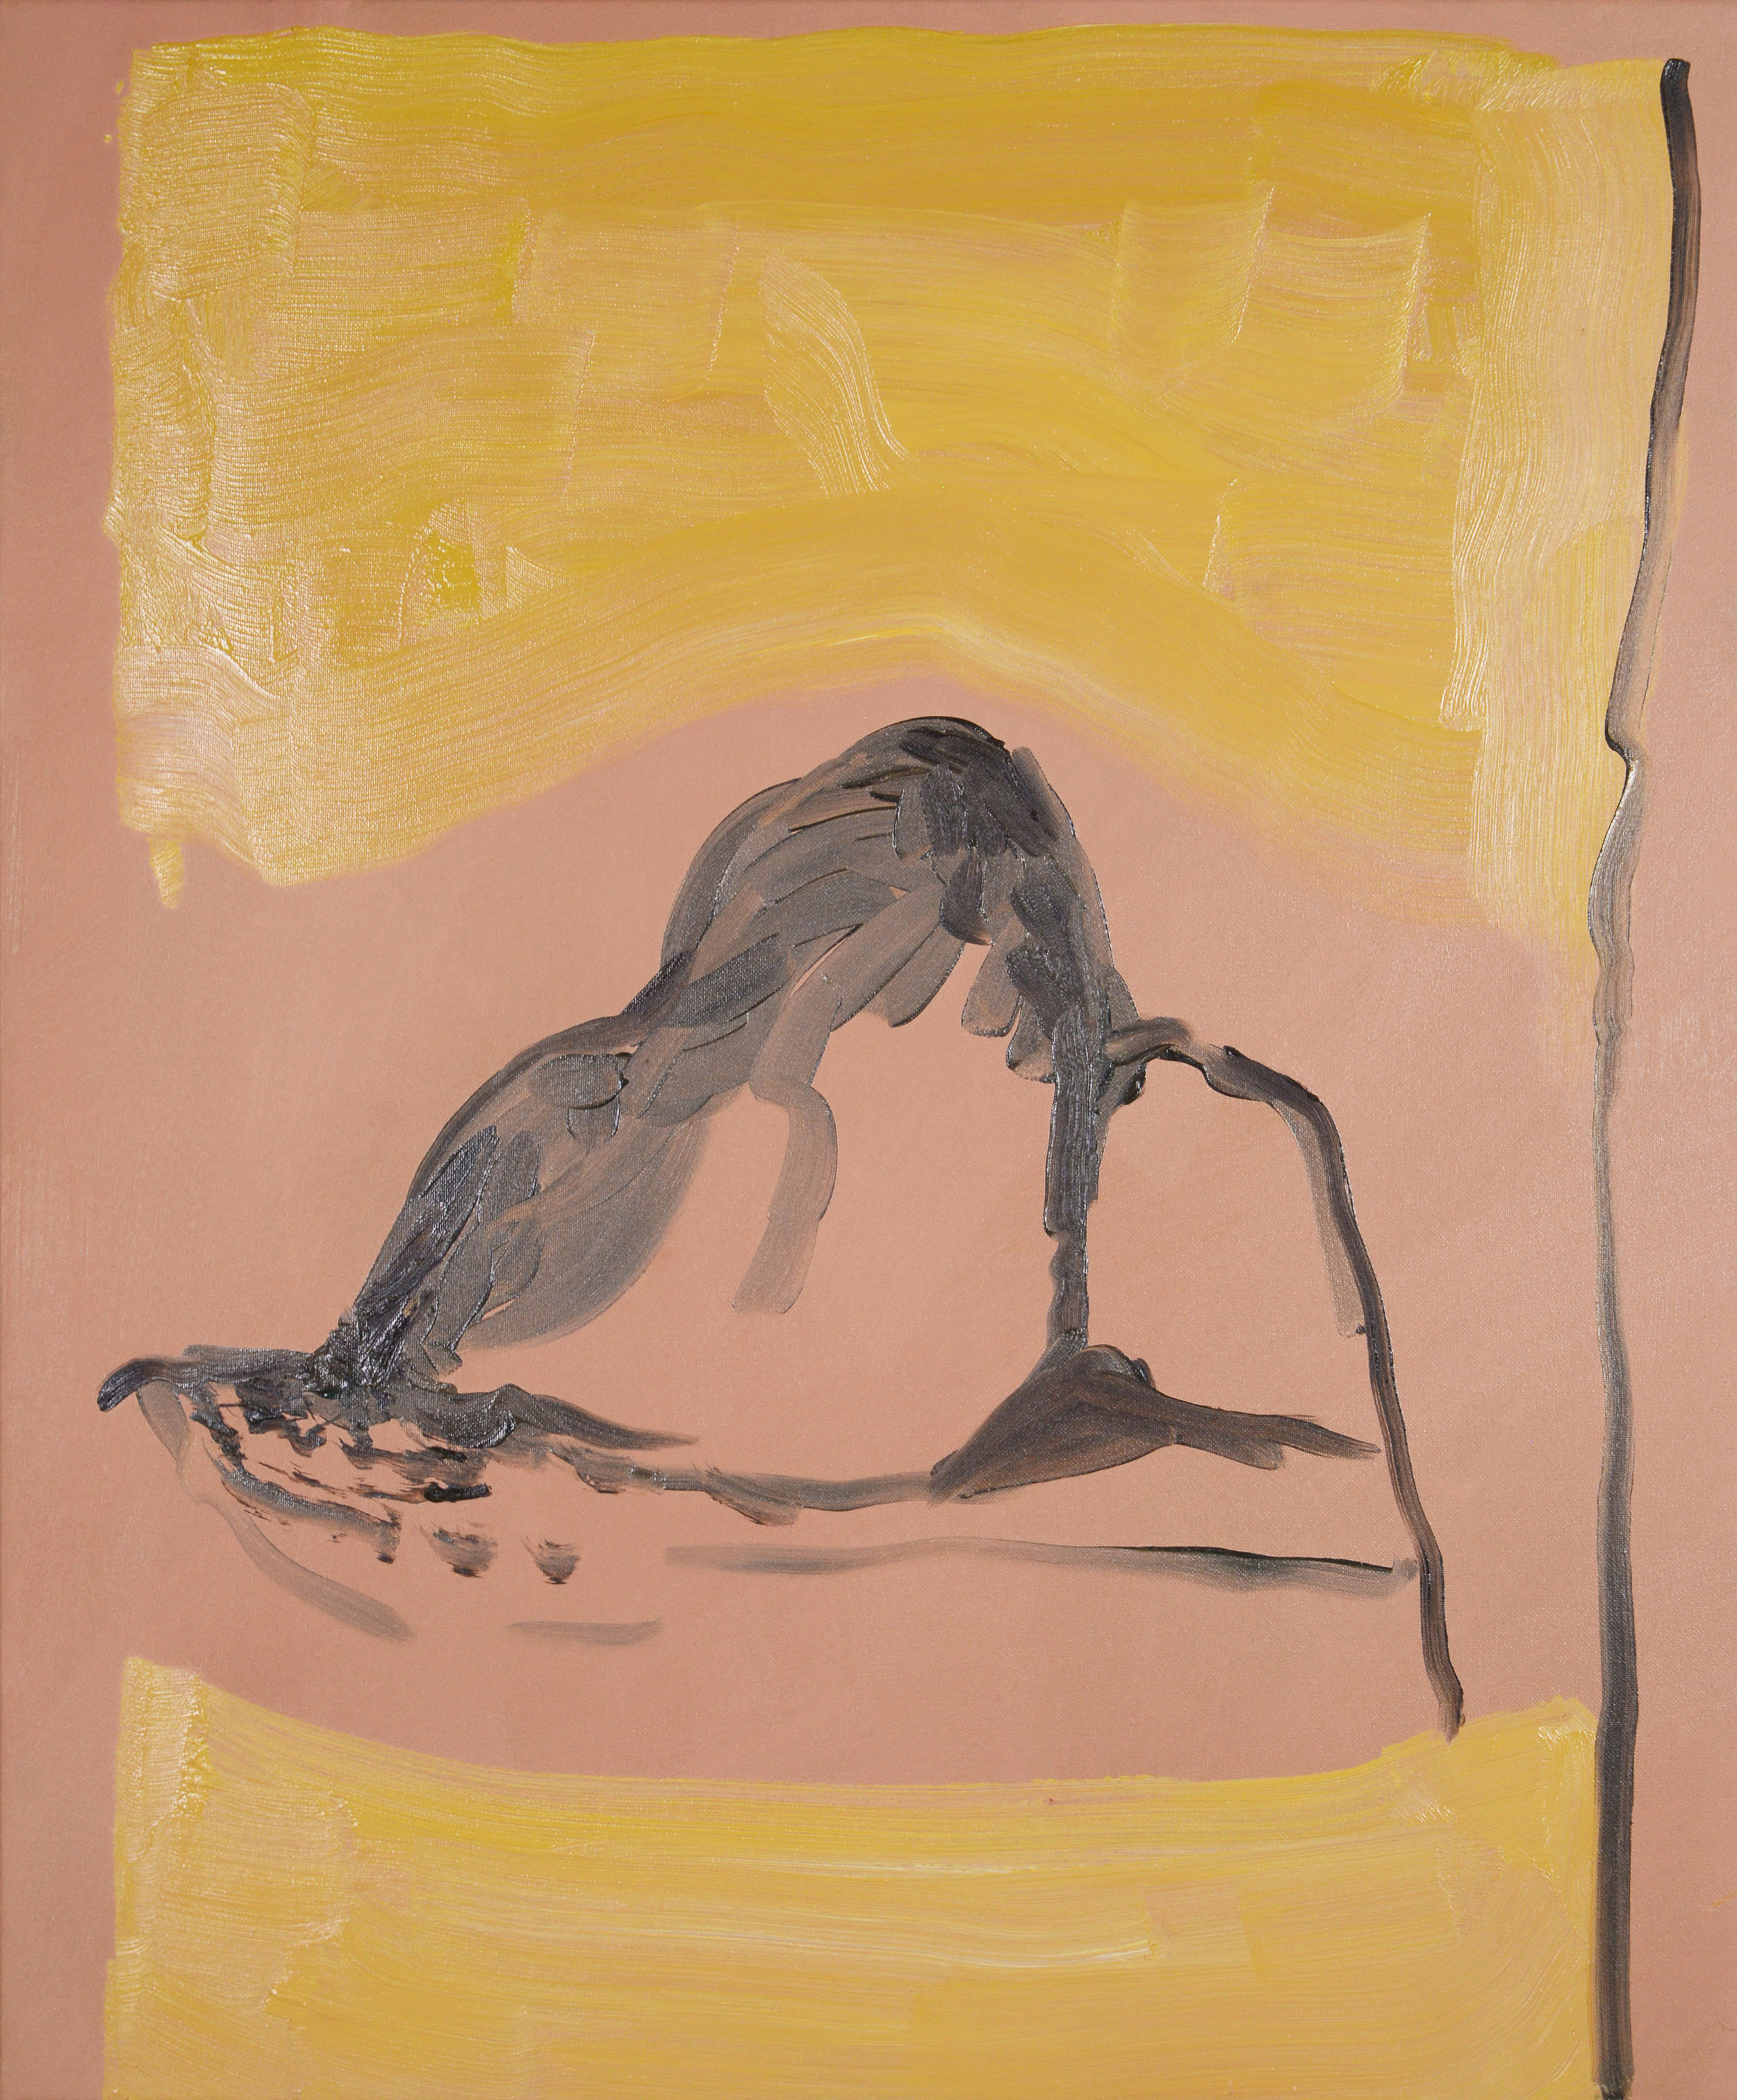 Bather, 2013, Oil on canvas, 60 x 50 cm